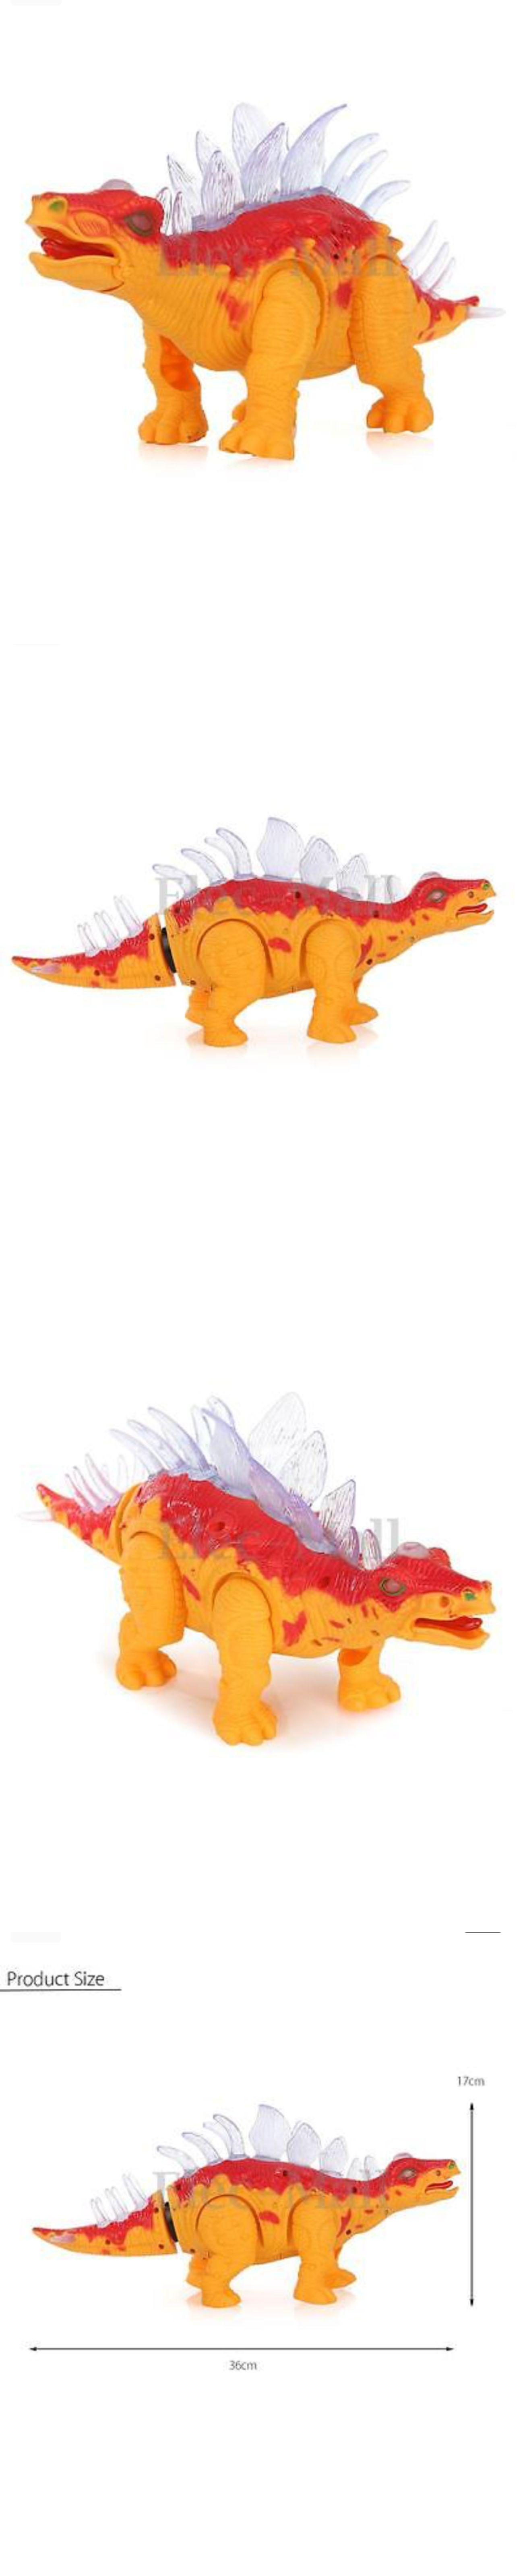 Walking  Dinosaur Stegosaurus Kids Light Up Toy Action Figure Sounds Movement